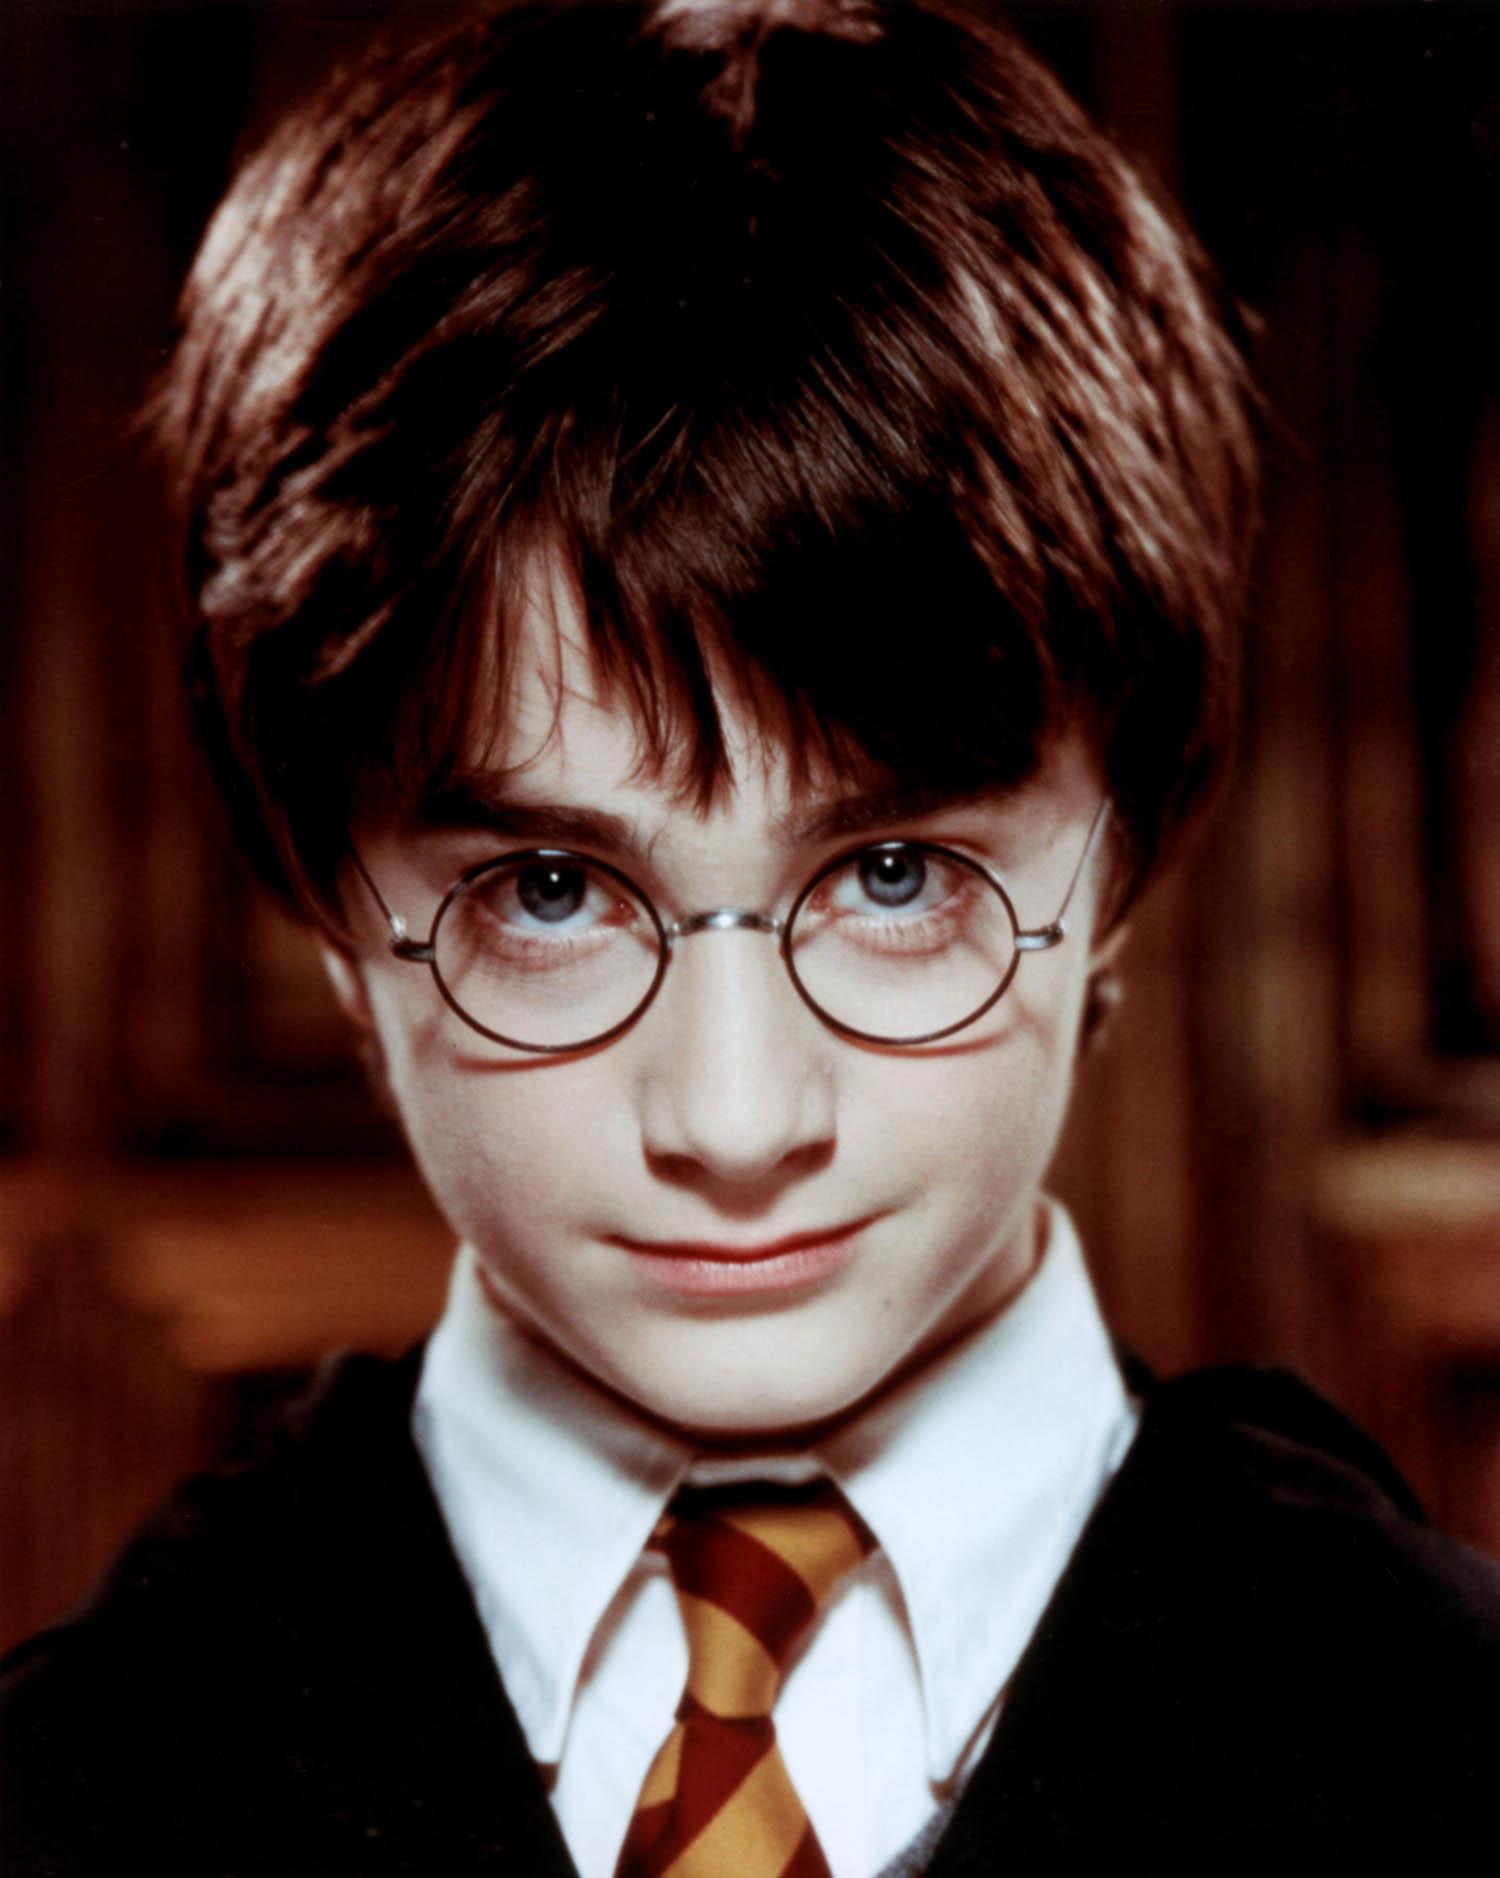 Гарри поттер это мне картинка